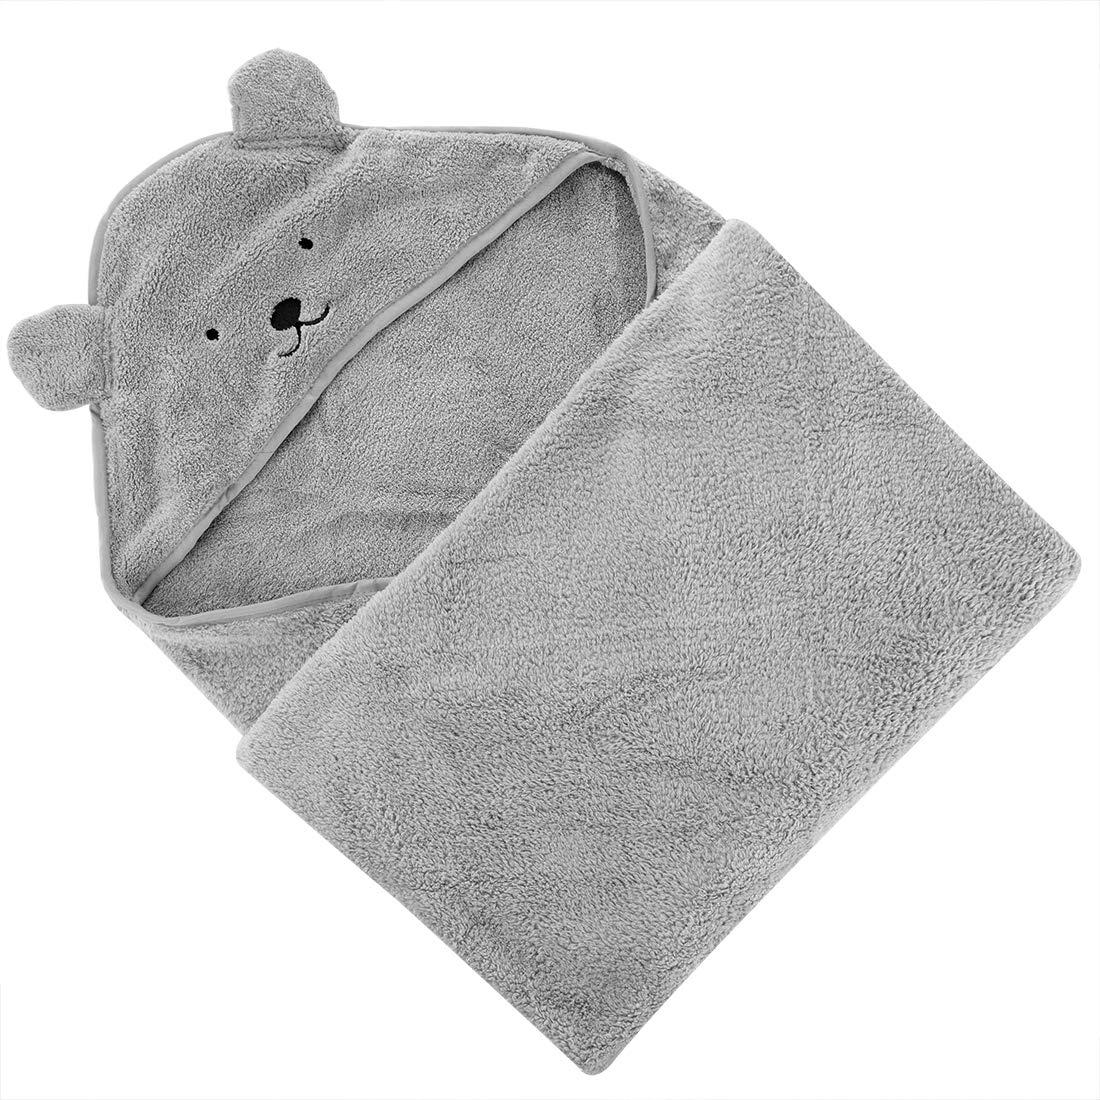 Pool or Swim LinkIdea 35 x 35 Kids Hooded Bath Towel Gray Beach Super Absorbent /& Quick-Dry Toddler Bath Beach Towels Washcloth Bathrobe for Girls Boys After Bath